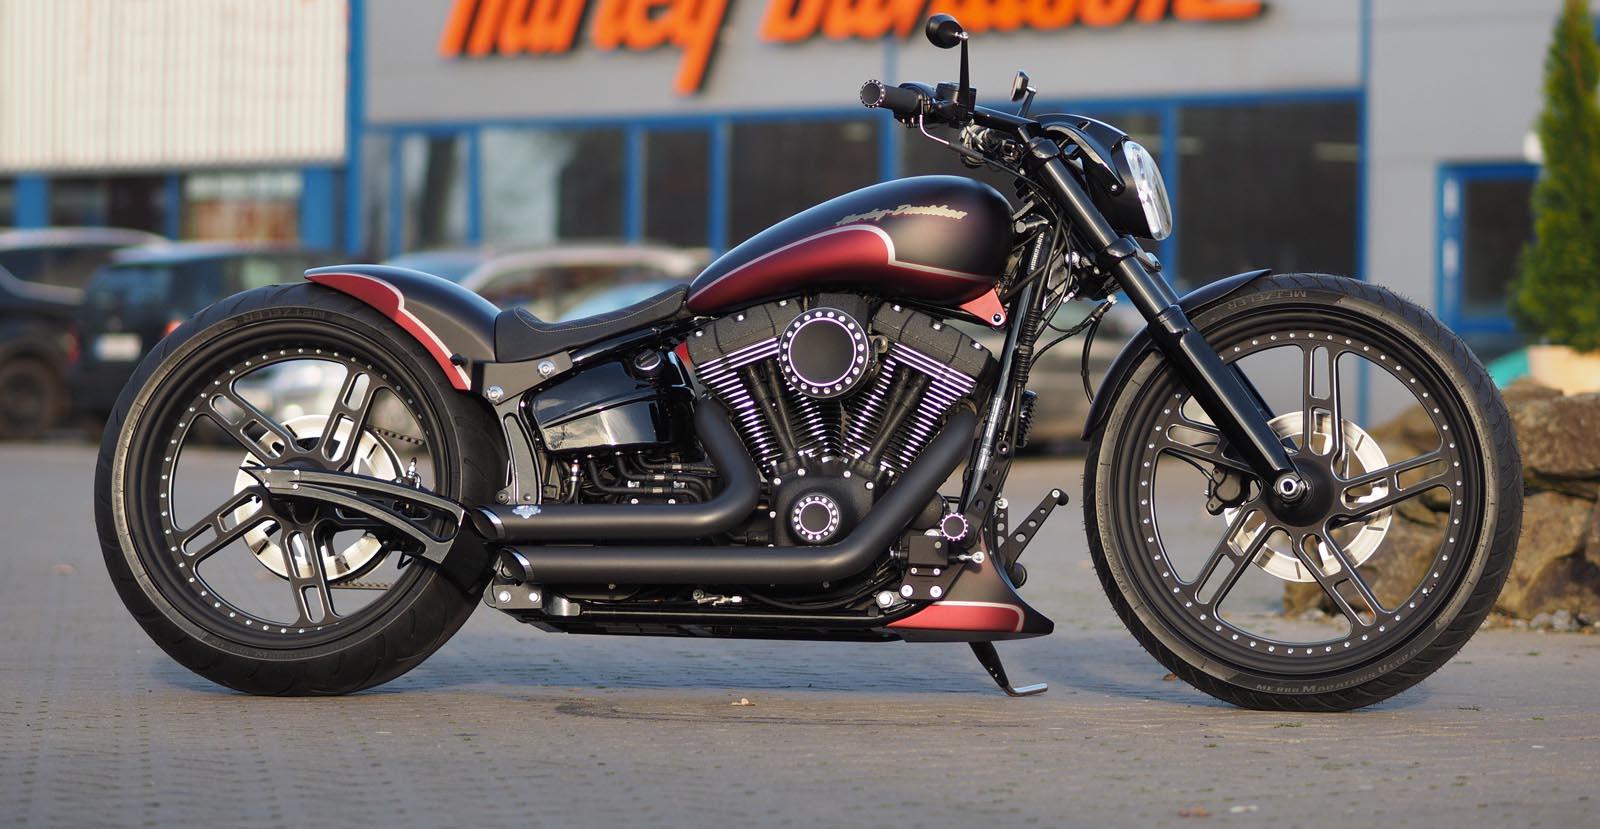 Harley Davidson Breakout Bikes For Sale